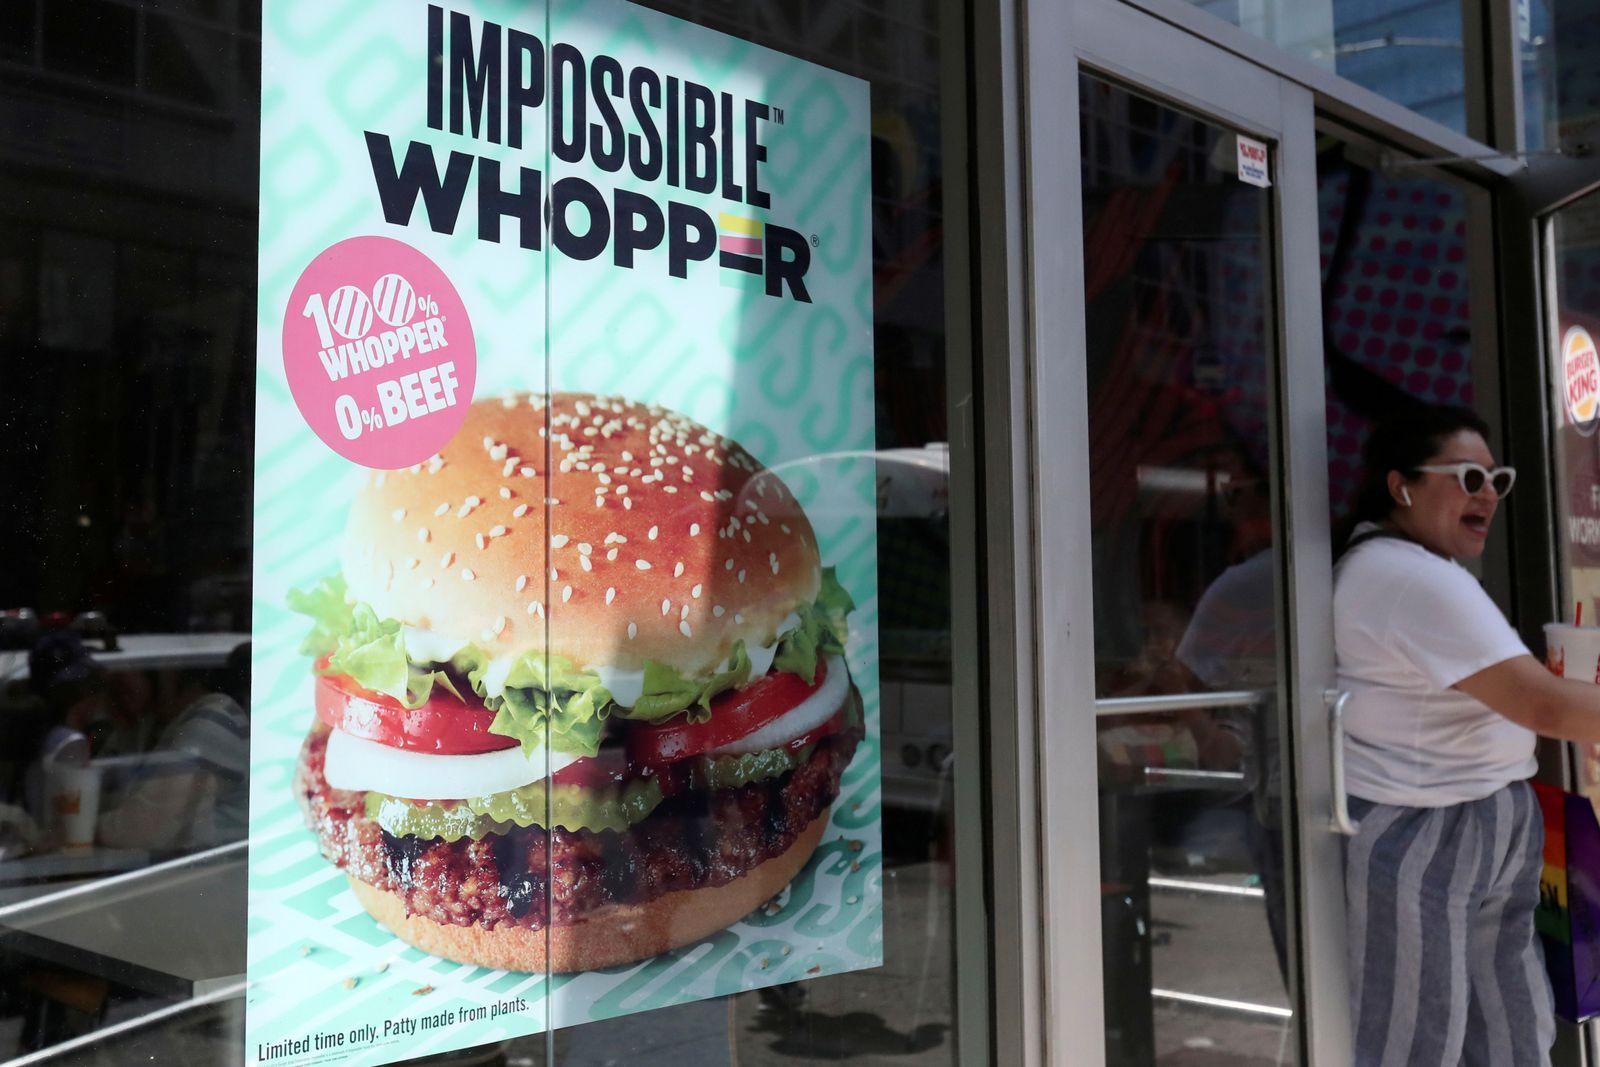 Soja Burger Whopper